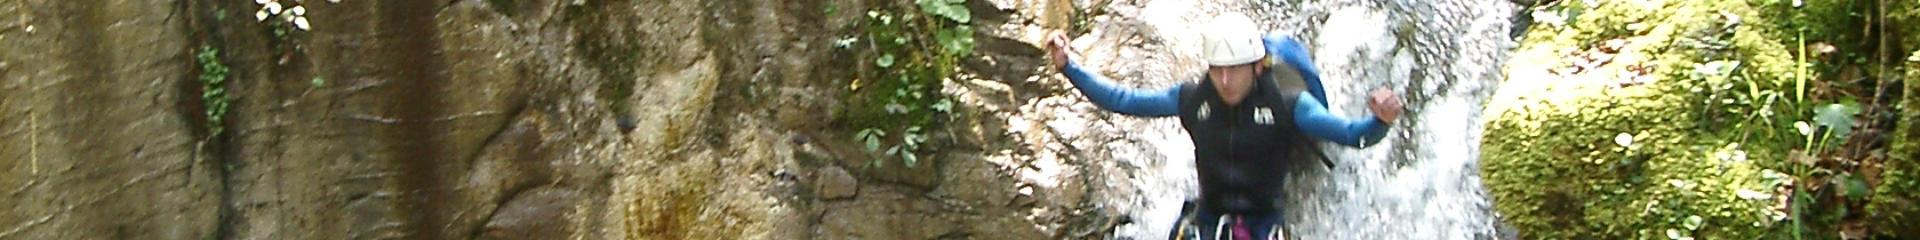 Canyoning dans les Pyrénées